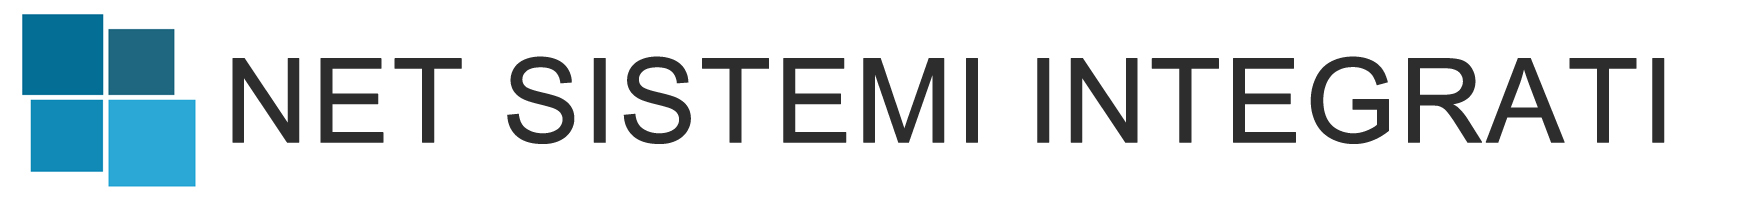 sito logo net sistemi